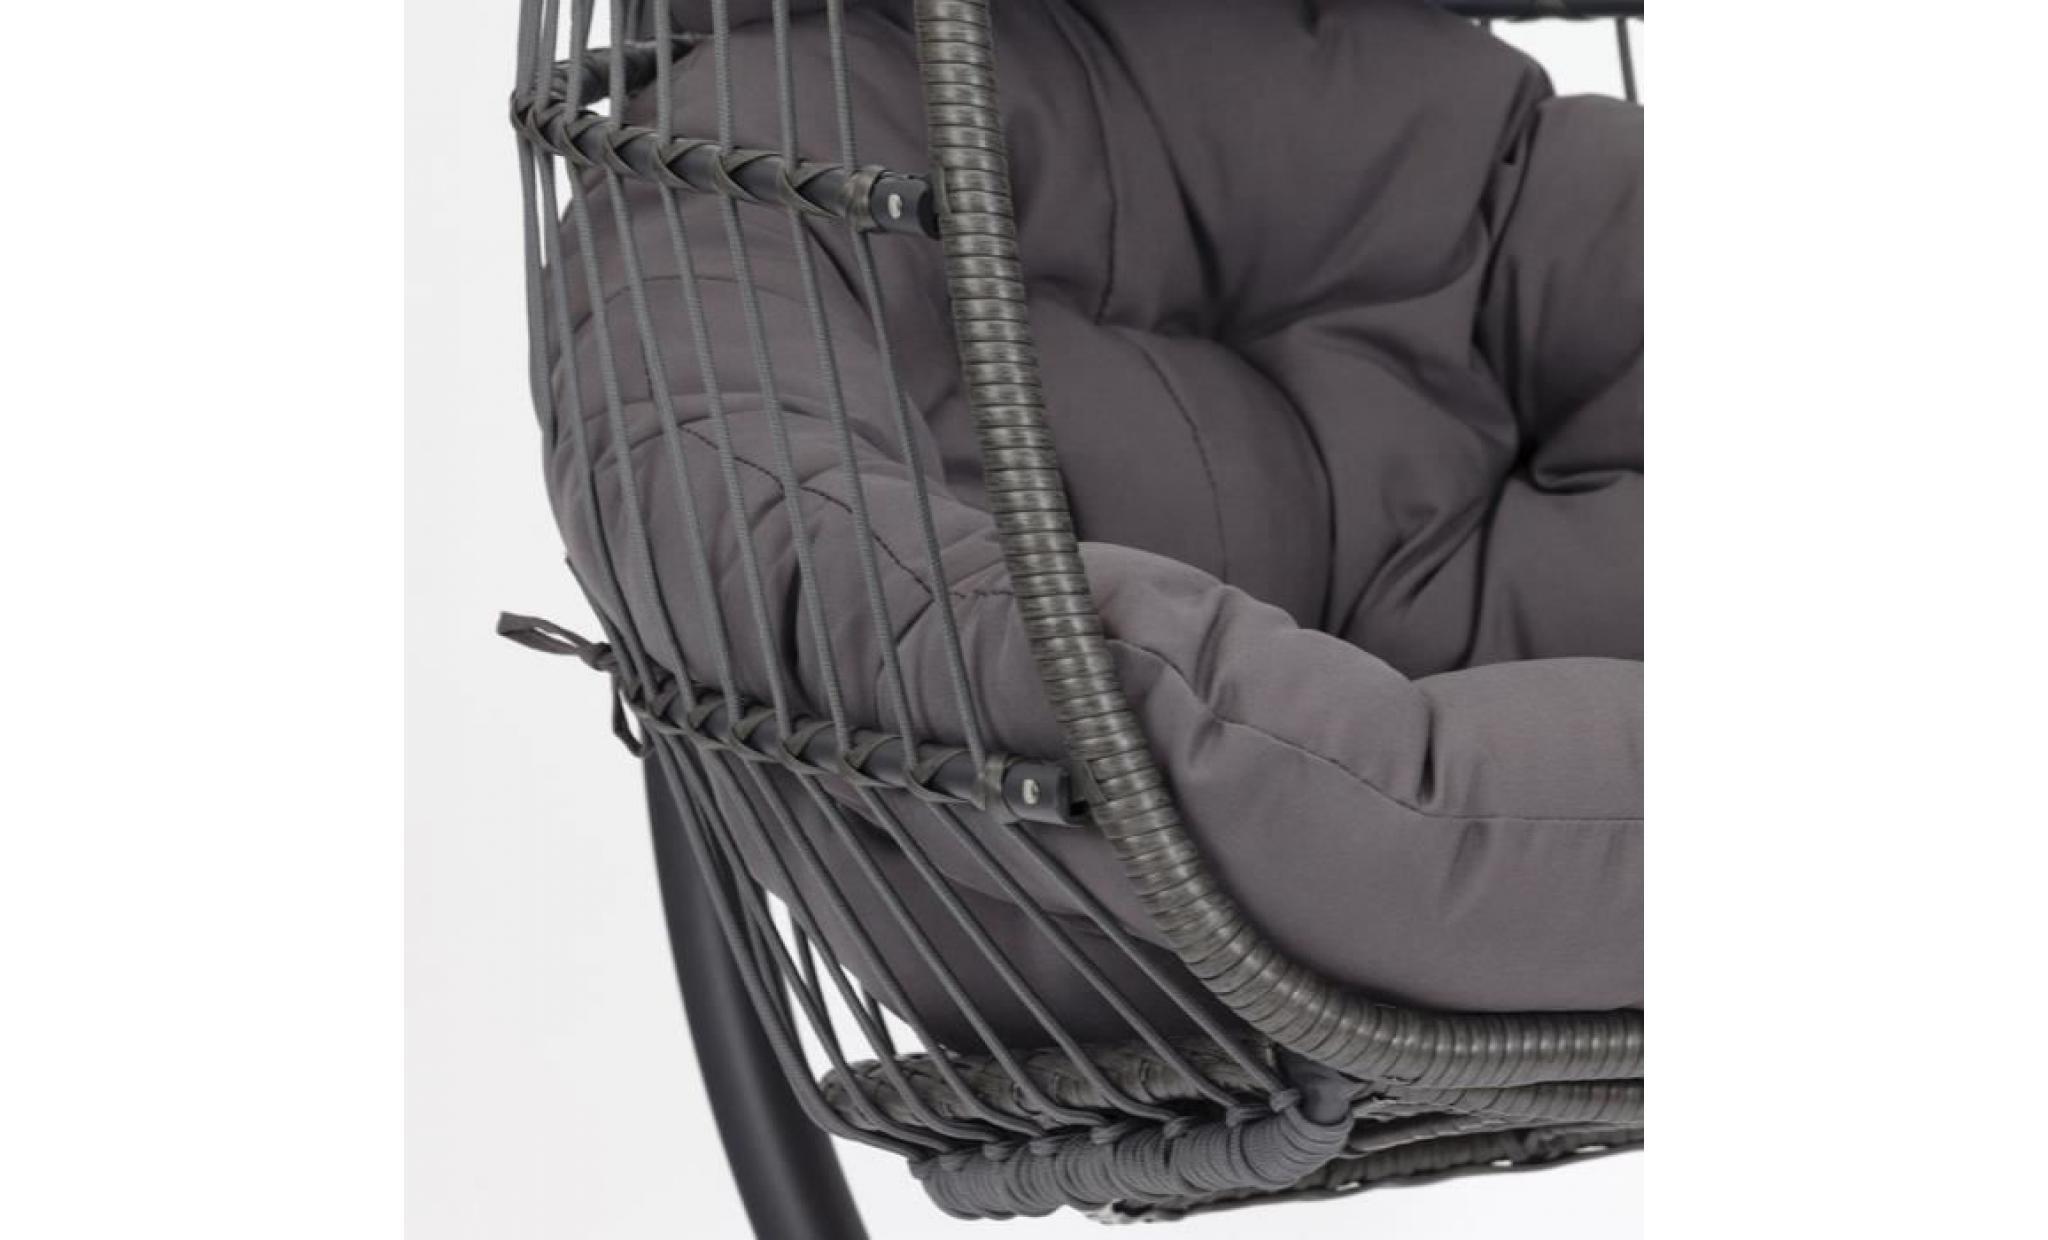 fauteuil suspendu resine tressee perfect fauteuil resine tressee ikea fauteuils bayil. Black Bedroom Furniture Sets. Home Design Ideas